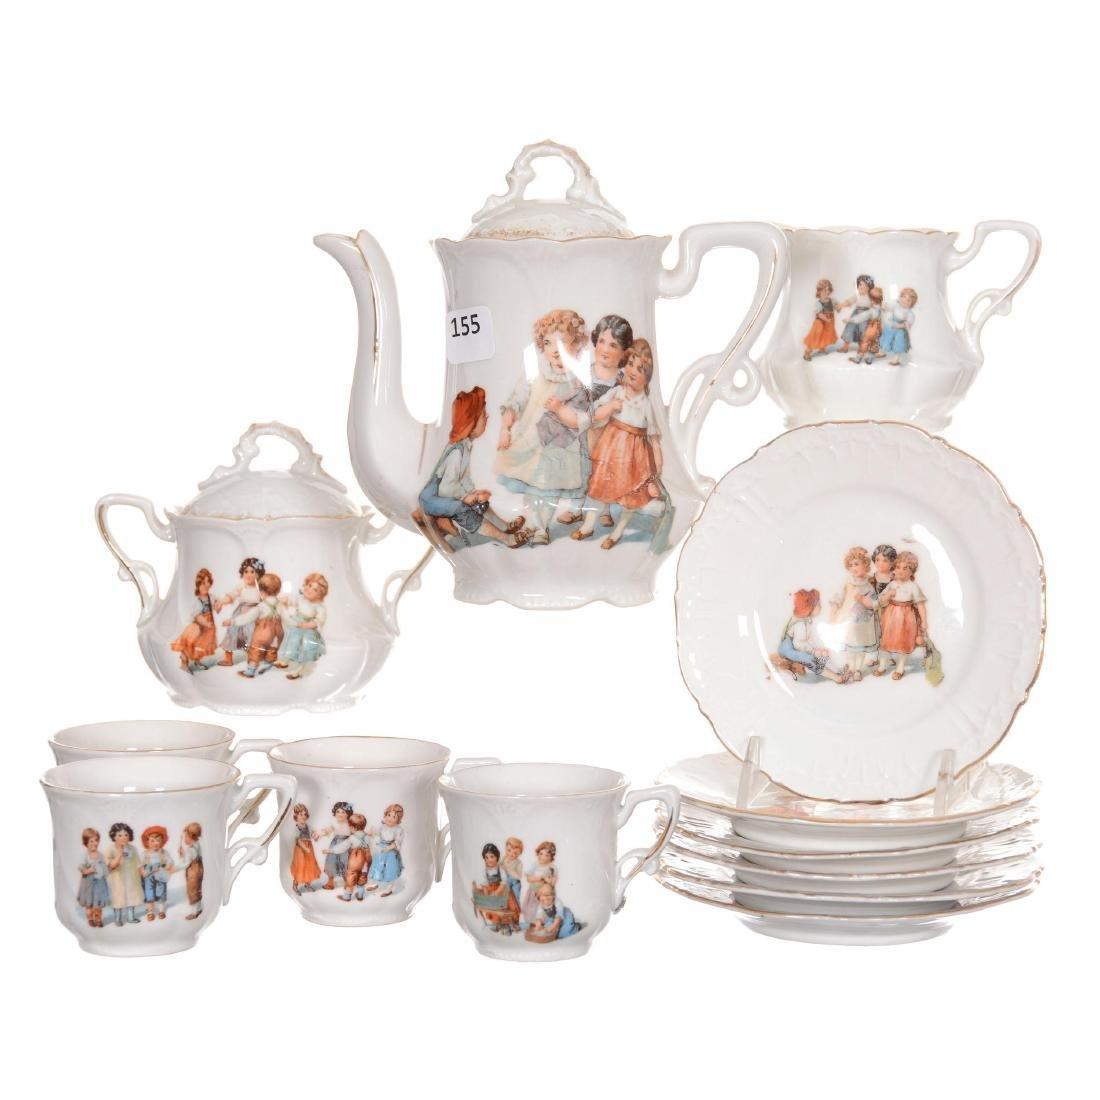 German Child's Tea Set